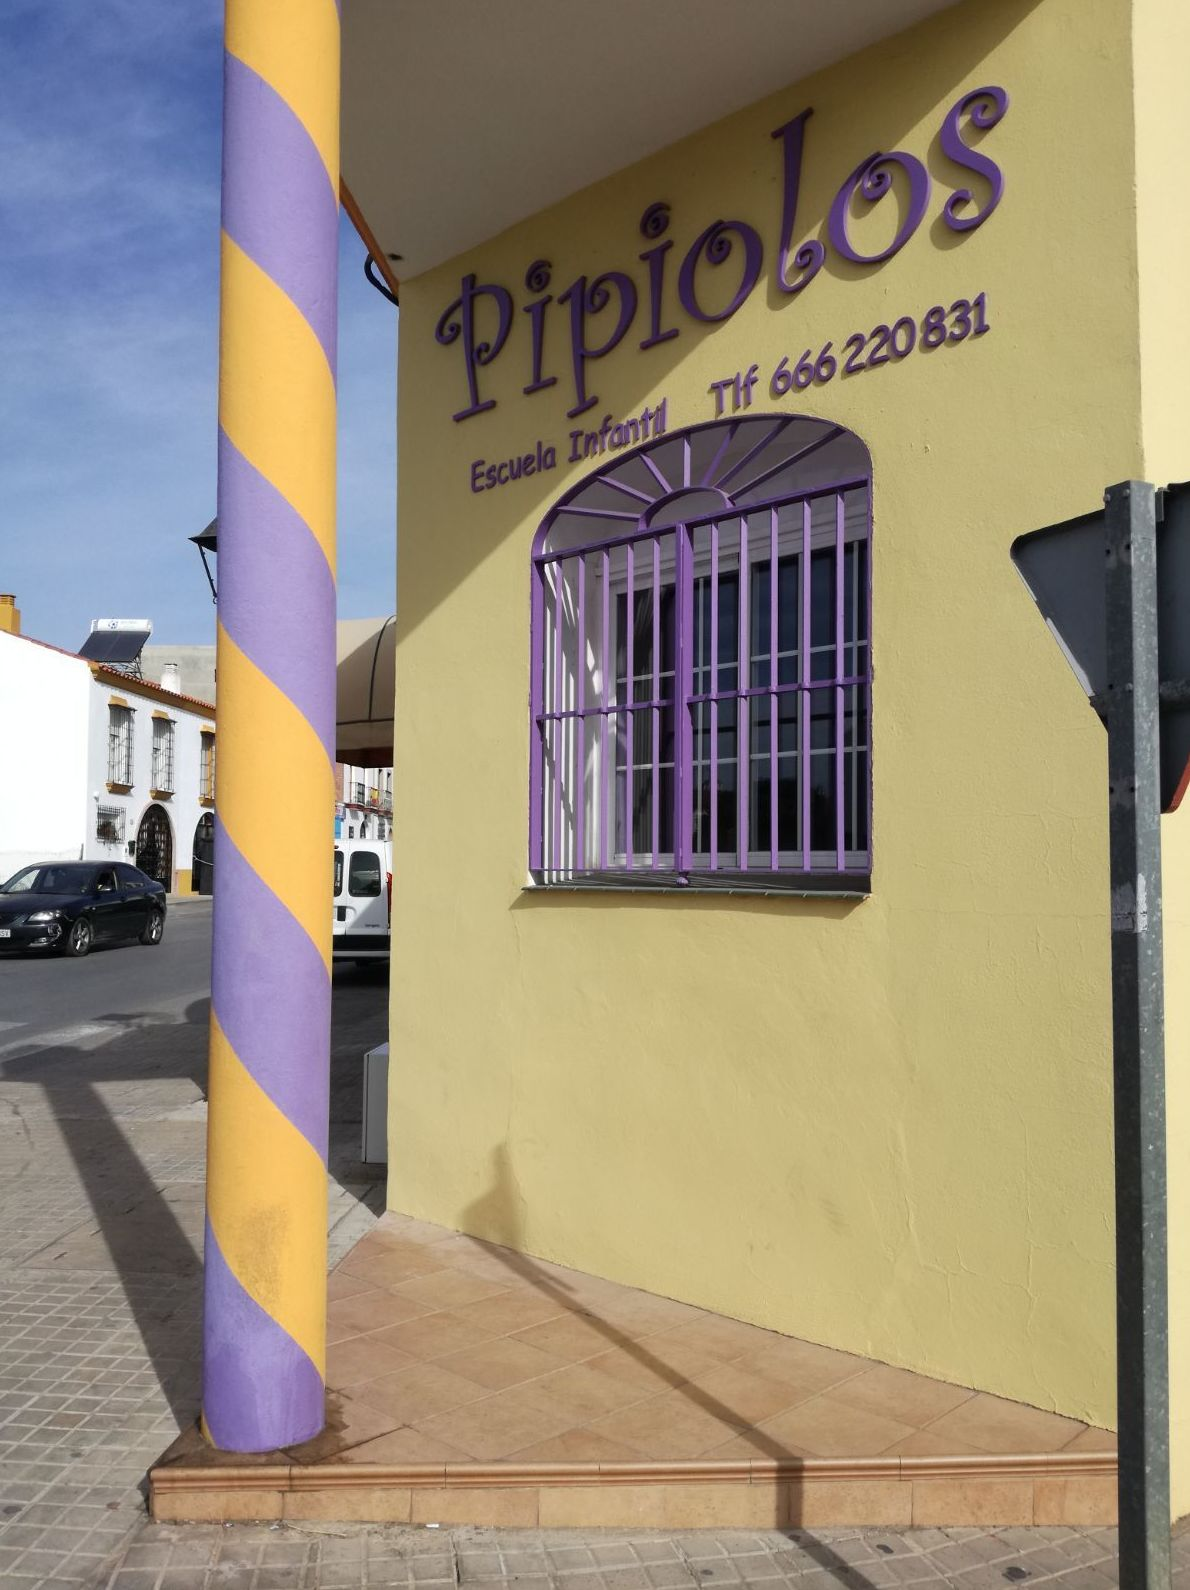 Foto 10 de Escuelas infantiles en Umbrete   Pipiolos Escuela Infantil